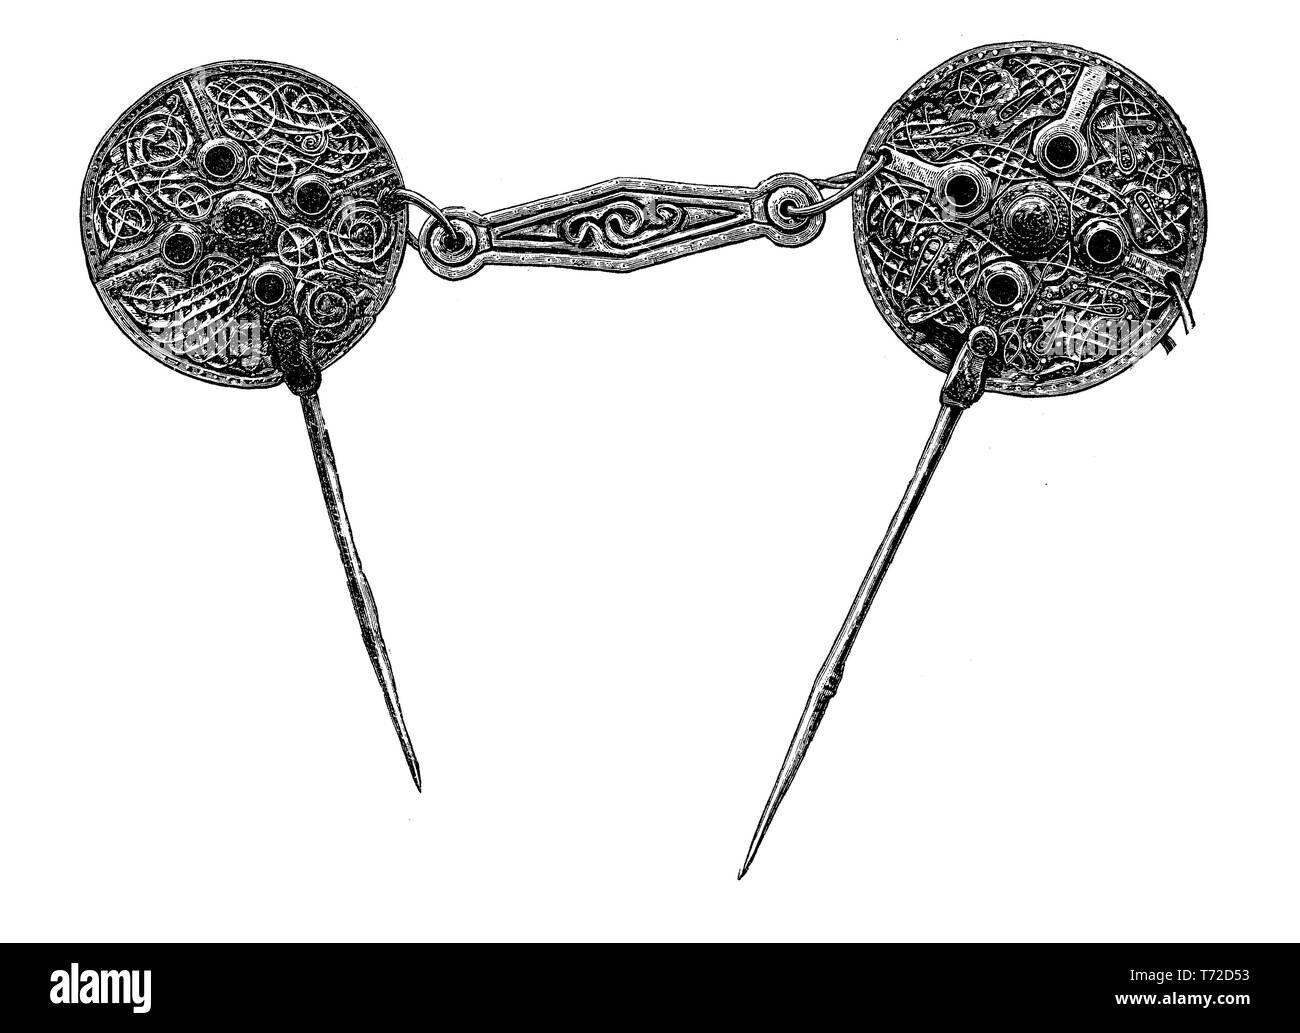 Decorative celtic silver nails Irish at the british Museum - Stock Image